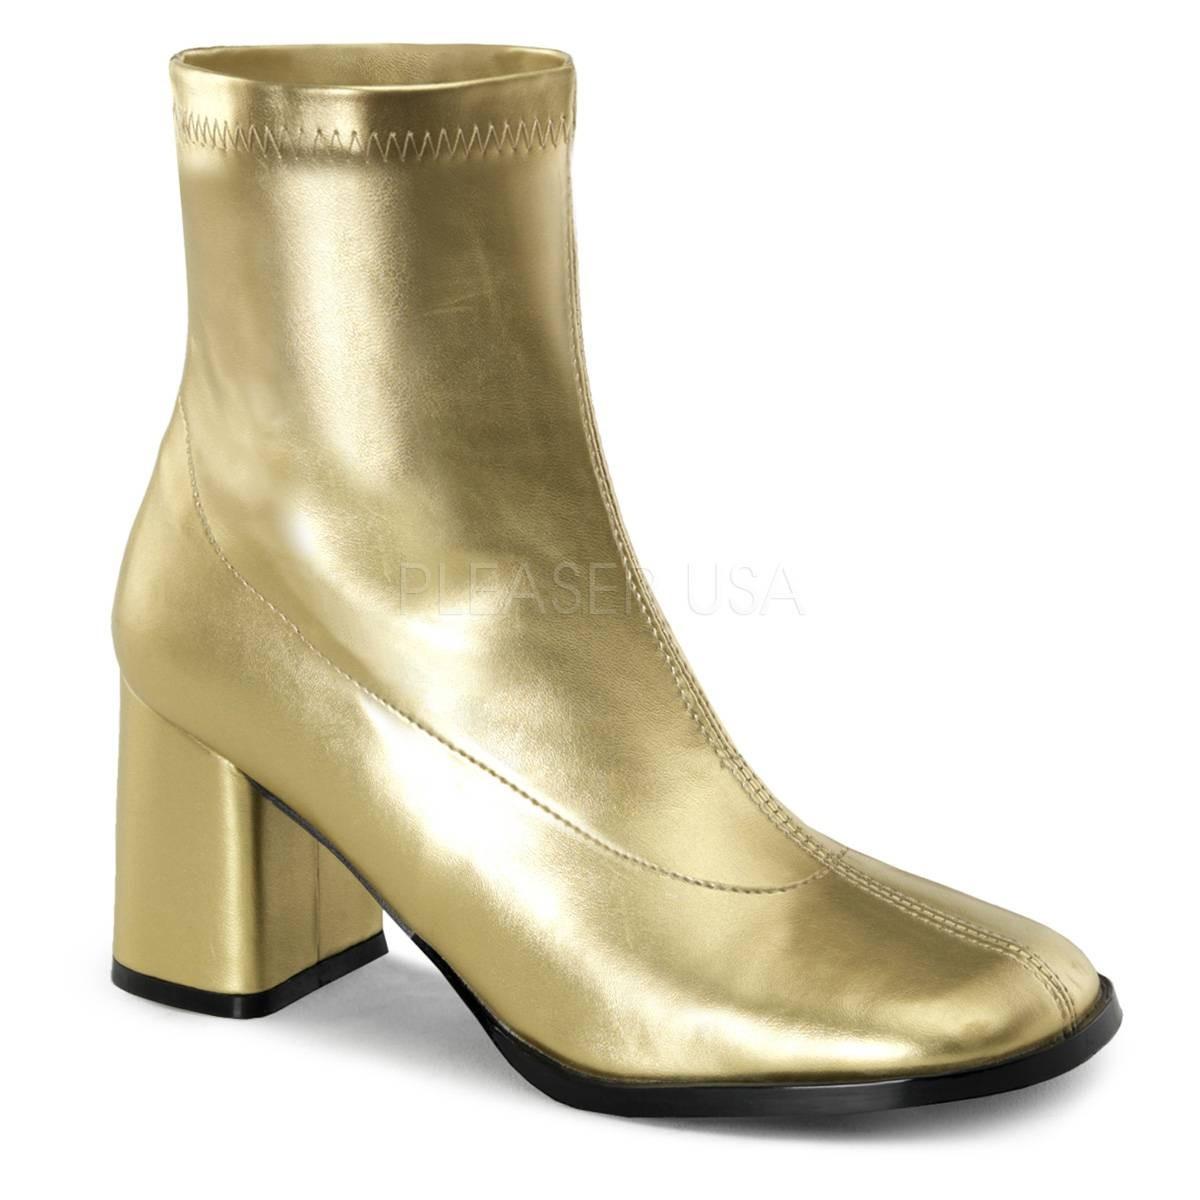 Stiefel - GOGO 150 ° Damen Stiefelette ° GoldMatt ° Funtasma  - Onlineshop RedSixty